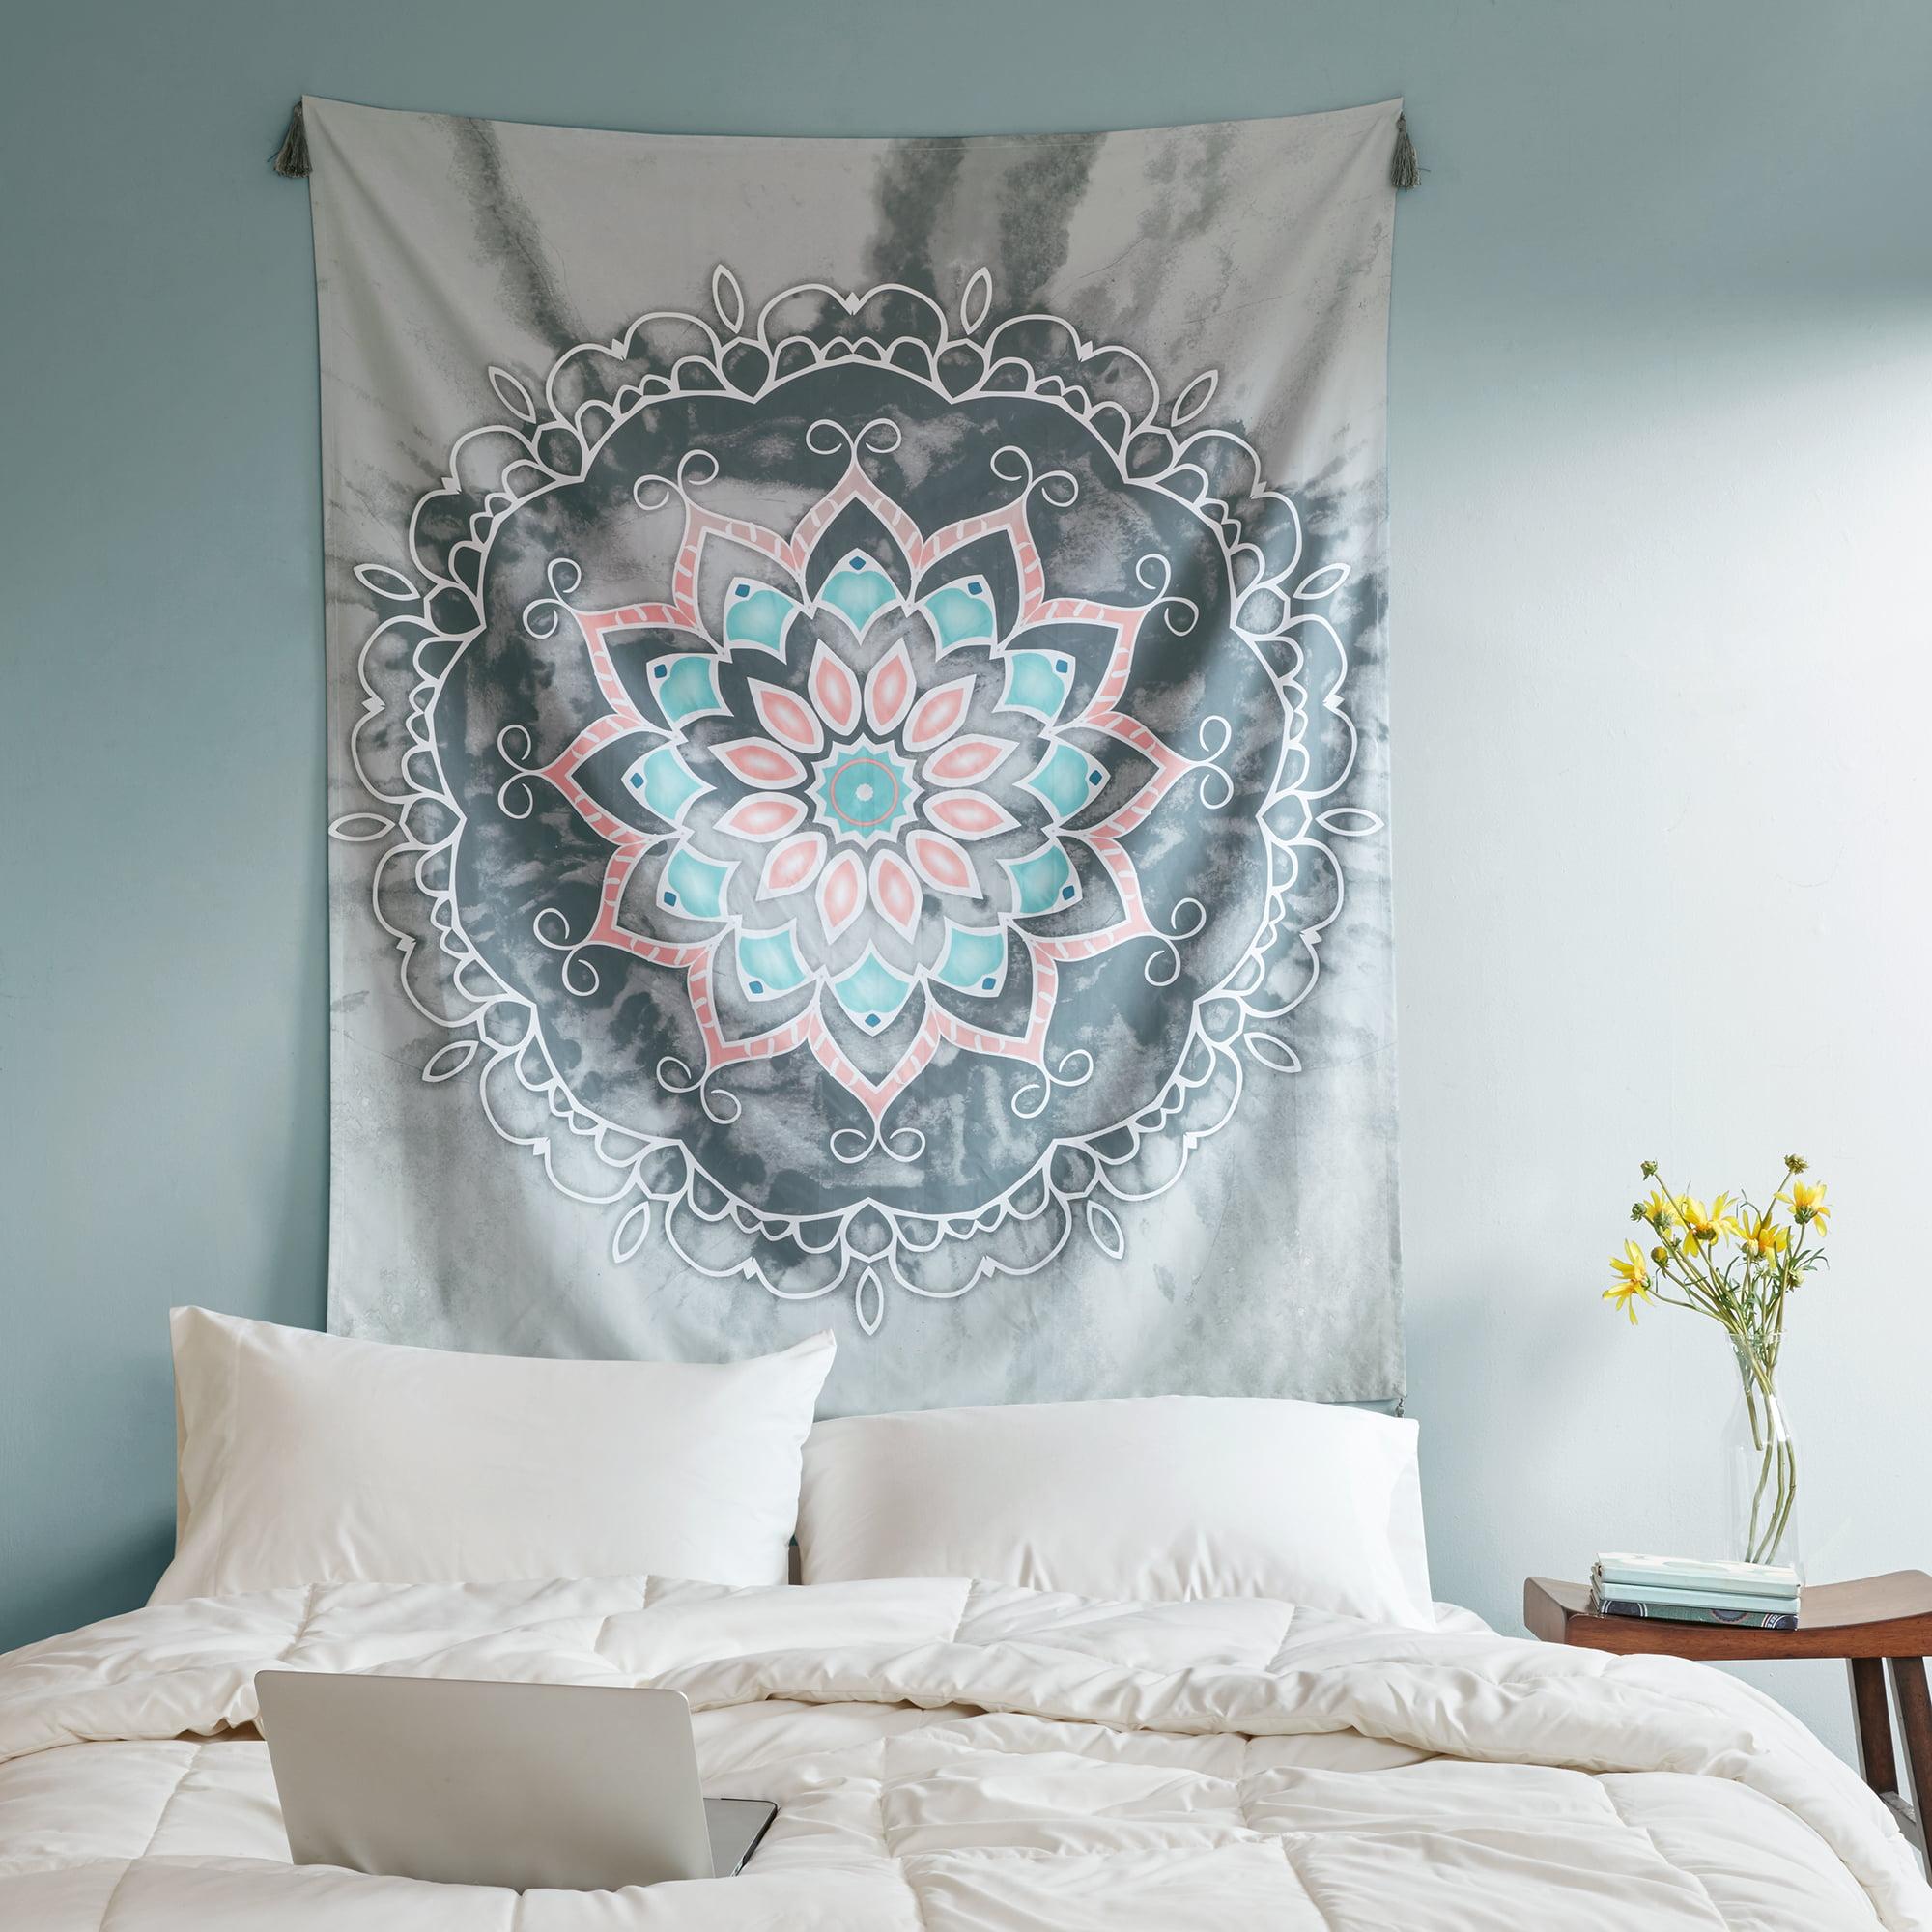 Grey Medallion Bohemian Decorative Wall Tapestry 50 x 60 in. by HANGZHOU BENRUSON HOME TEXTILES CO.,LTD.